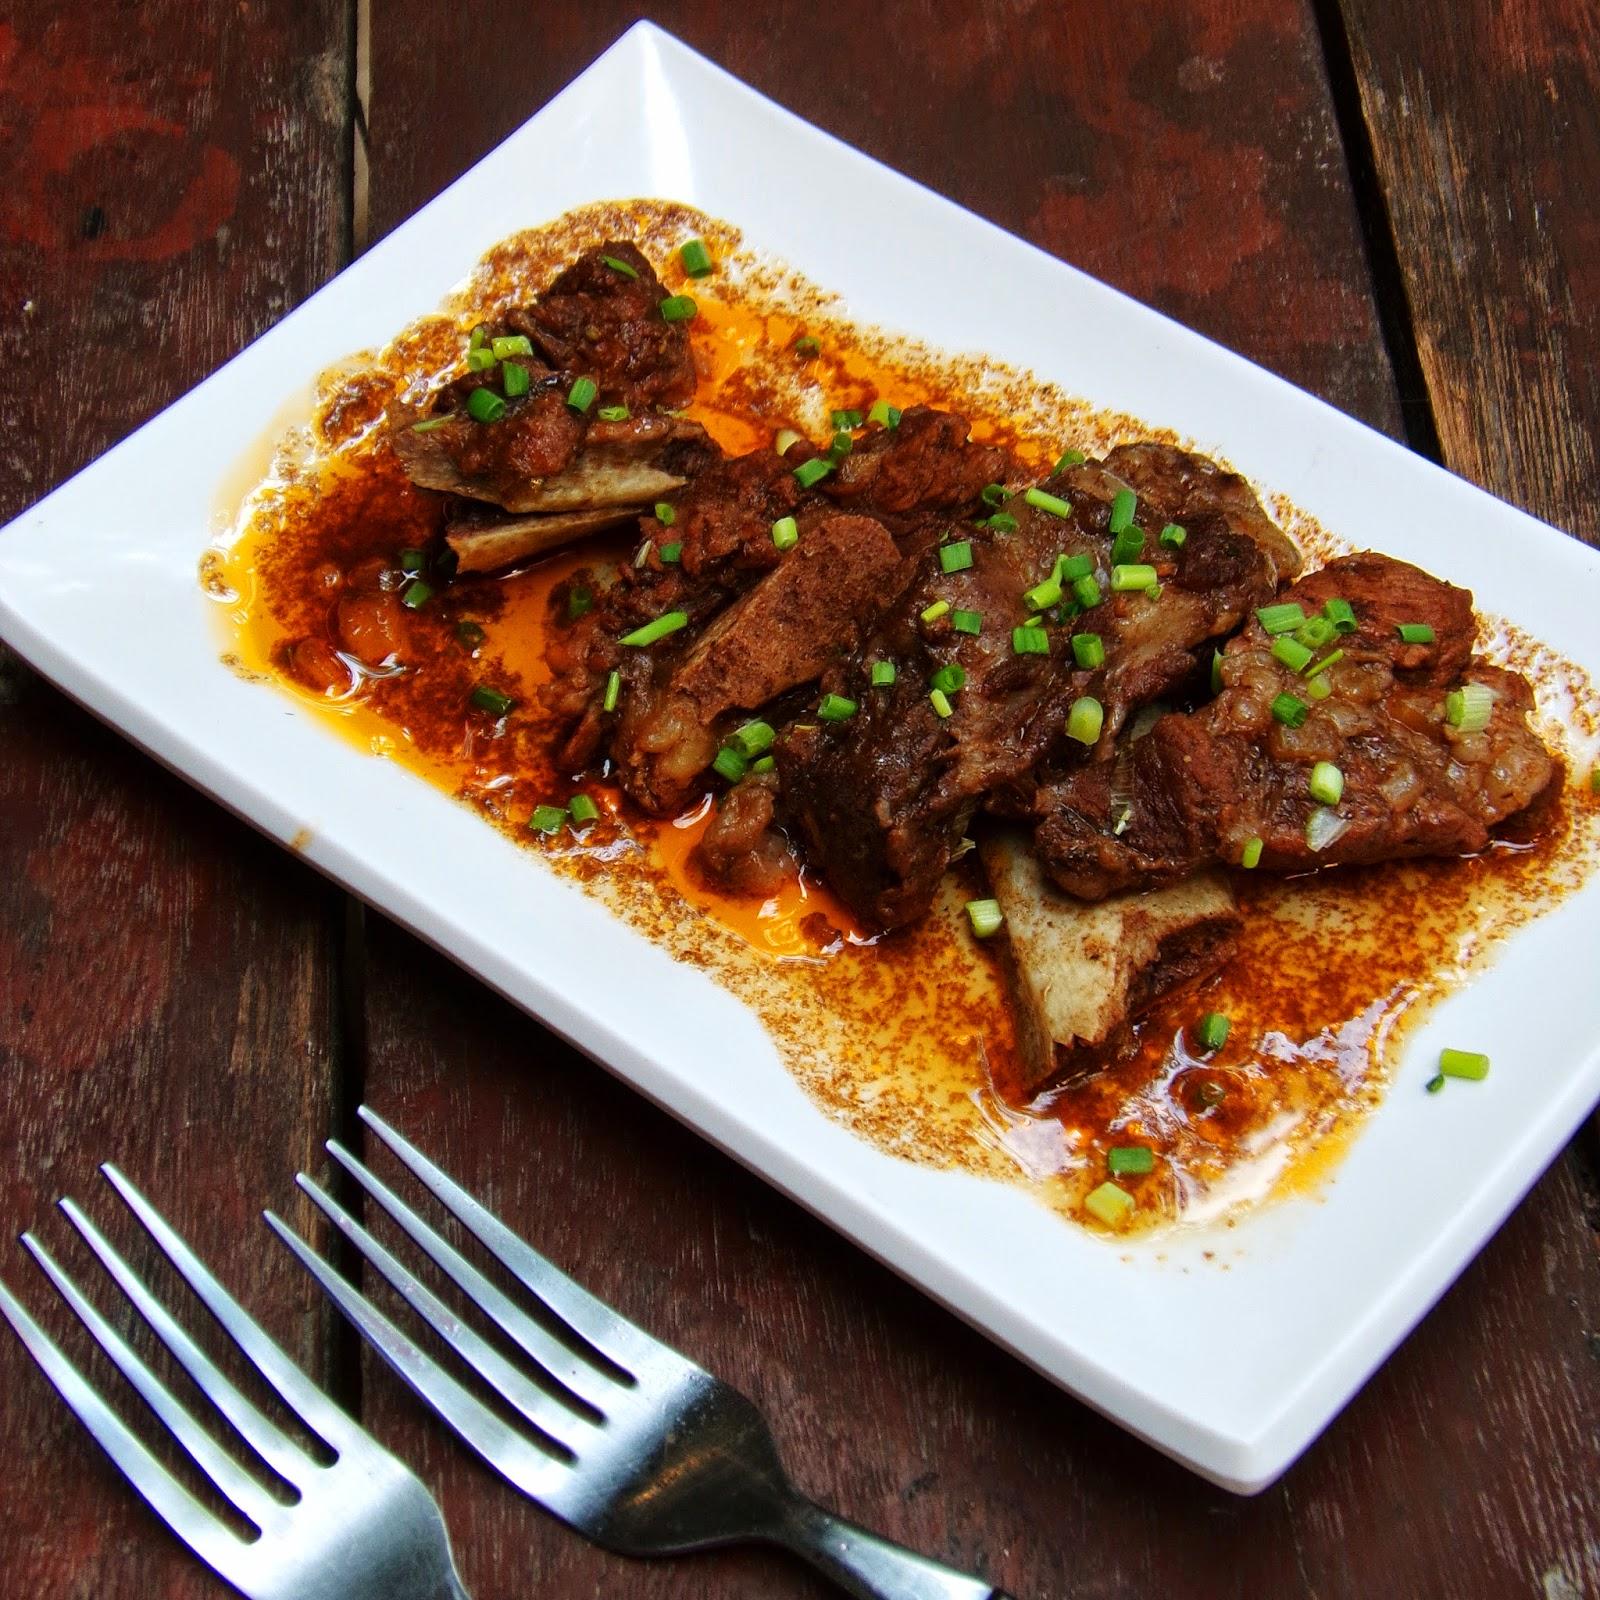 bbq pork ribs, pork spare rib recipe, rib recipes,  cooking pork spare ribs, spare ribs recipe, recipe for ribs